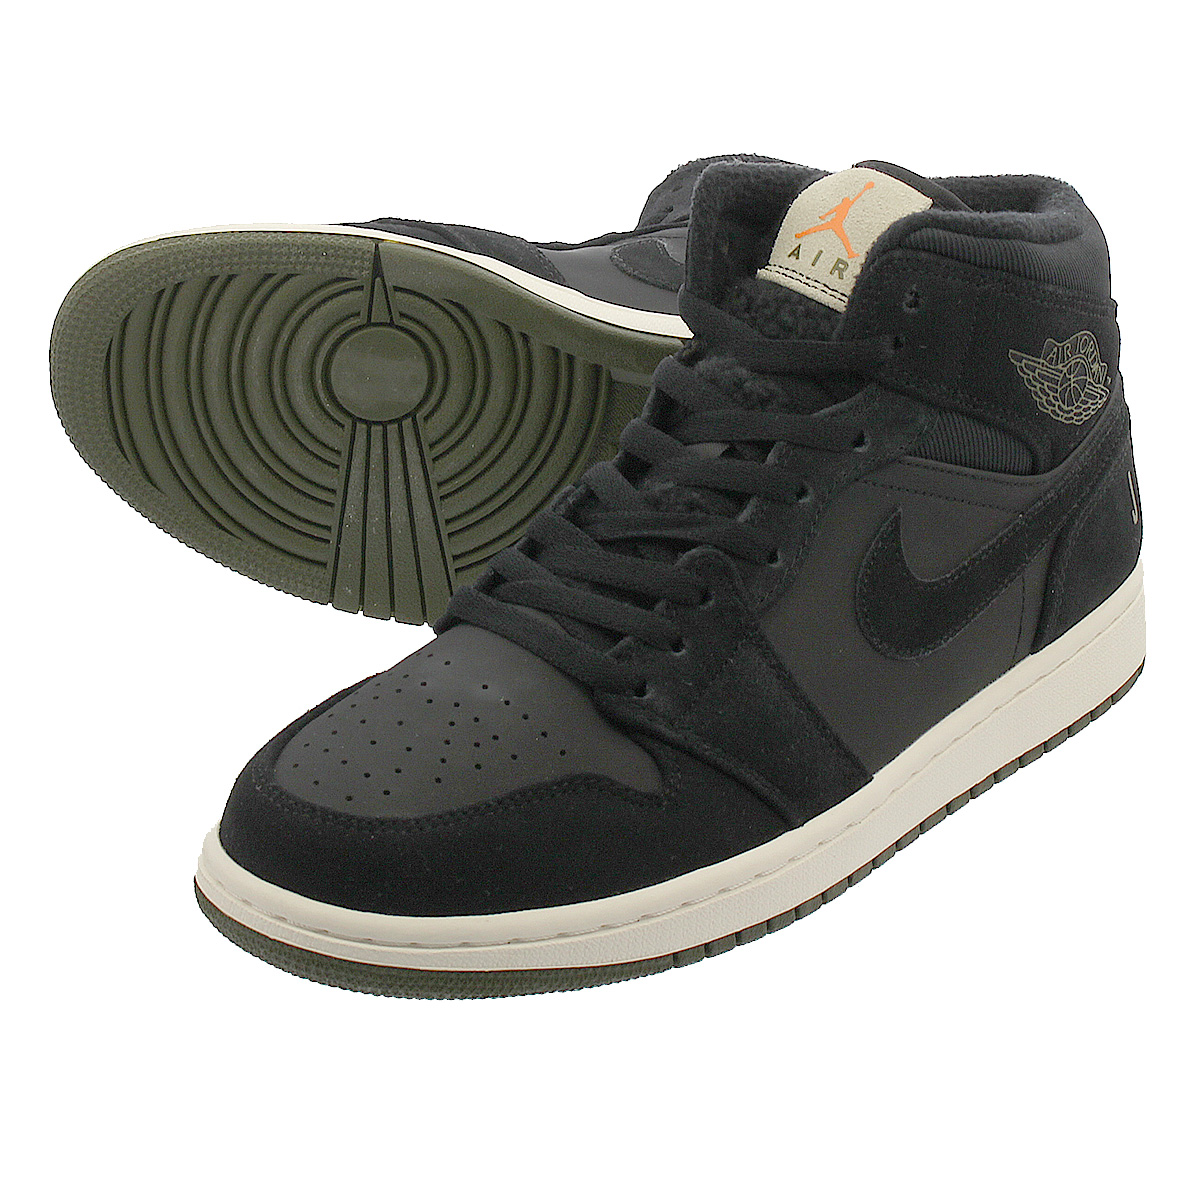 promo code 12f9c 9873e NIKE AIR JORDAN 1 MID Nike Air Jordan 1 mid BLACK/OLIVE CANVAS/SAIL/CONE  bq6579-001